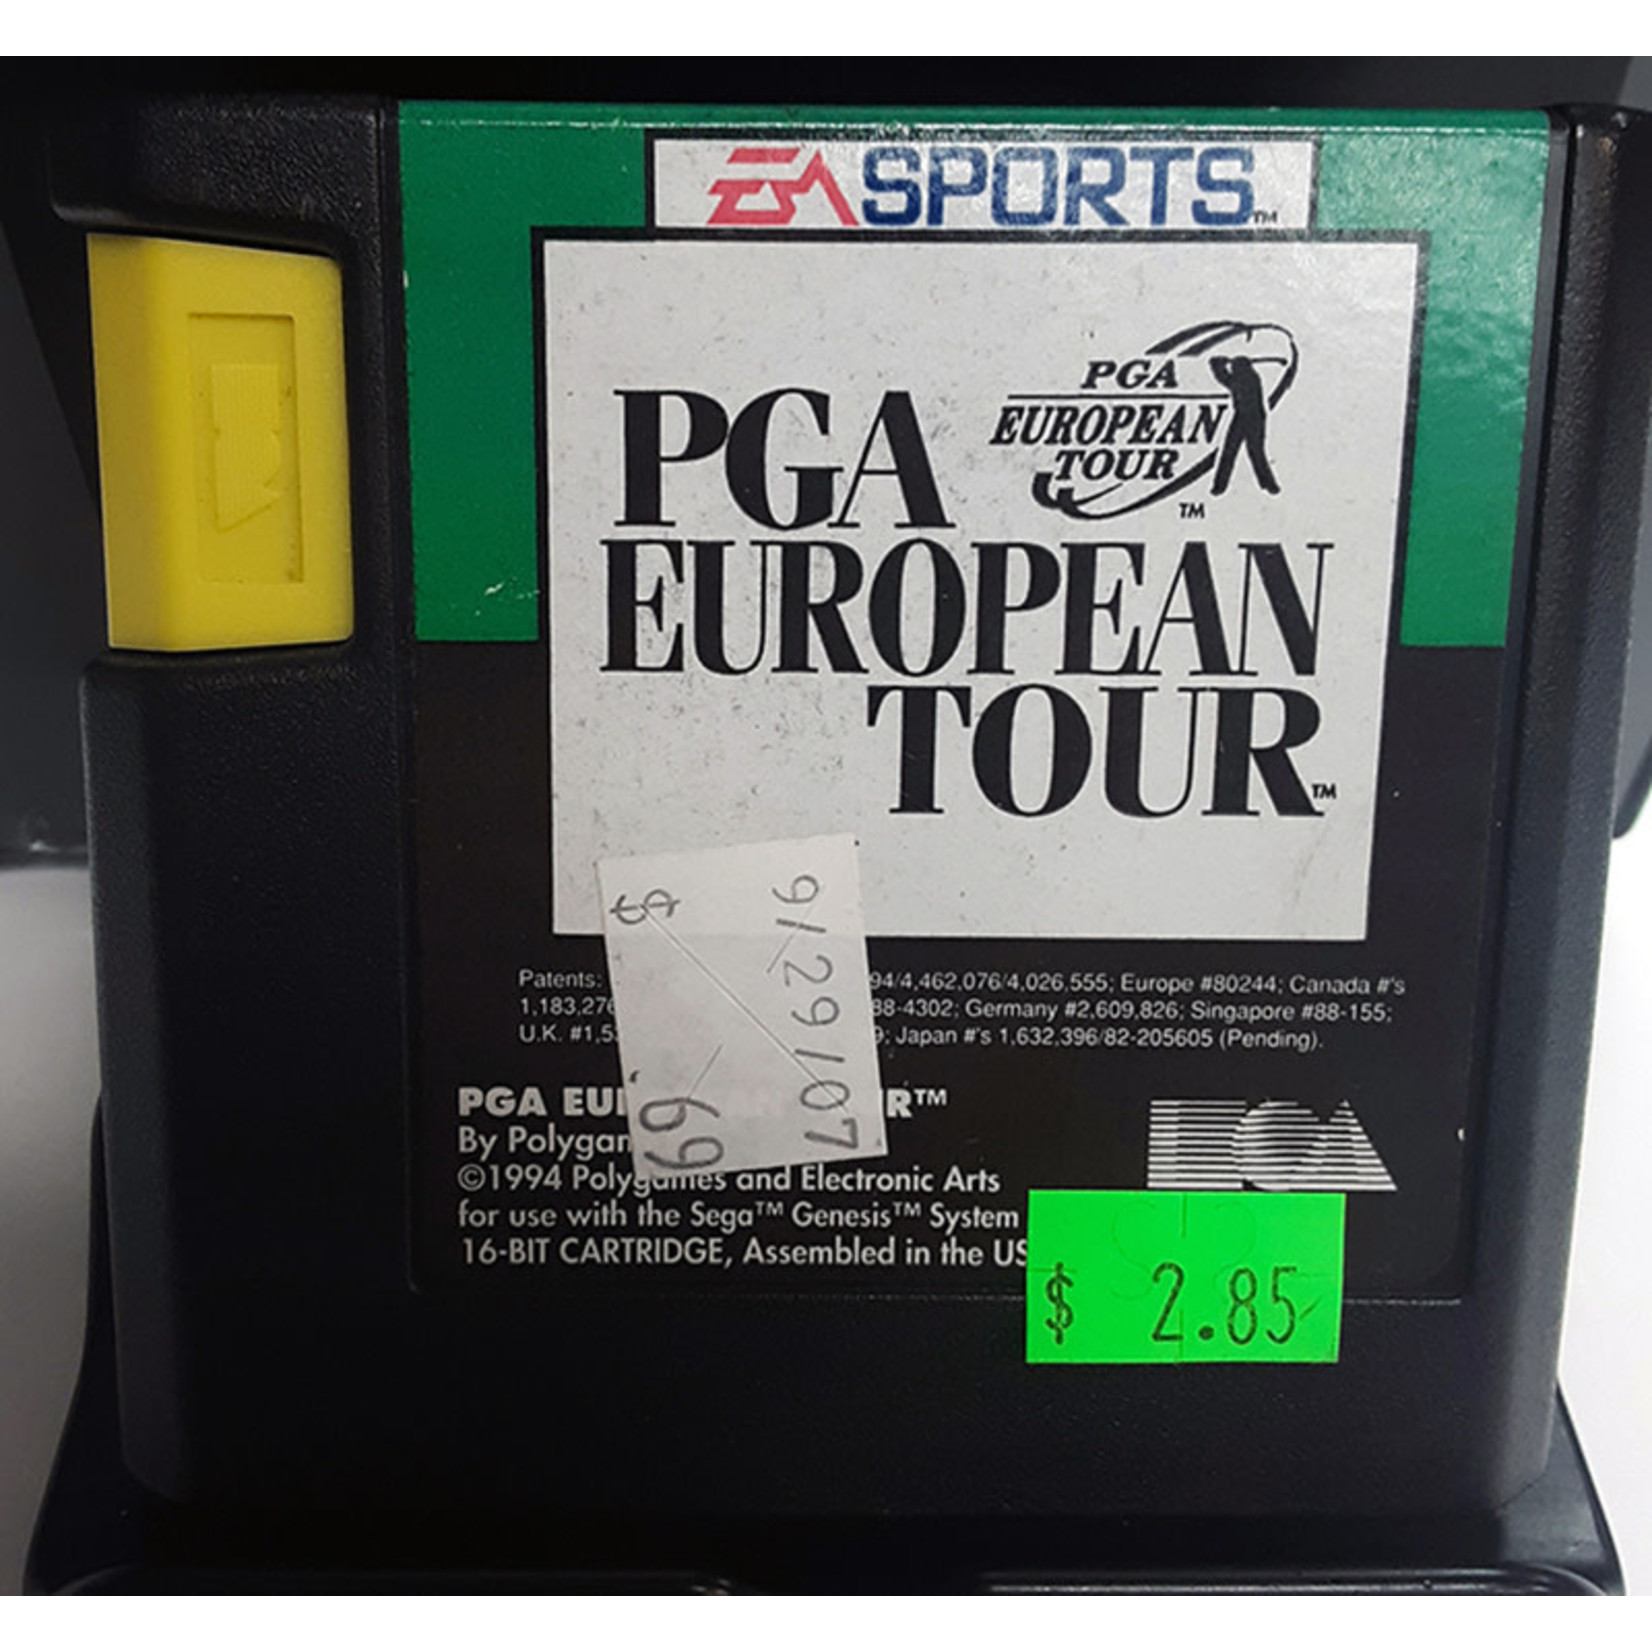 sgu-PGA European Tour (cartridge)